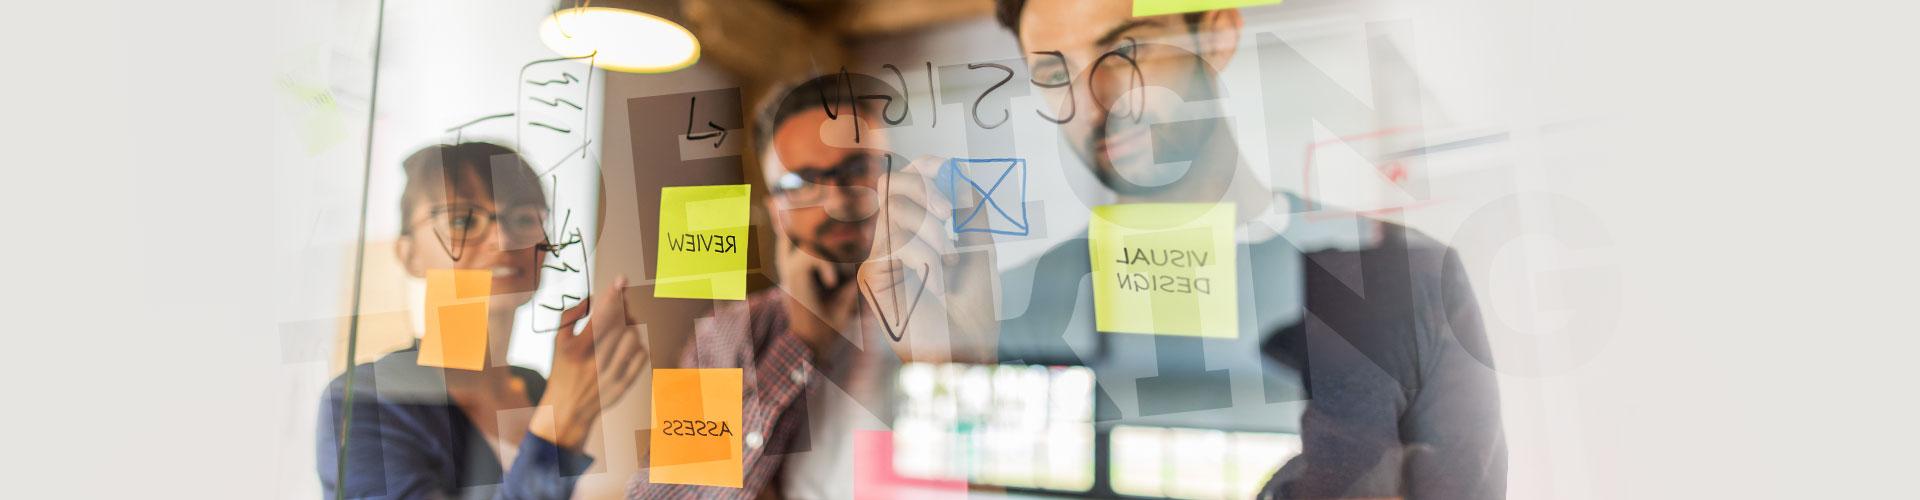 Les 10 règles du Design Thinking - BAO